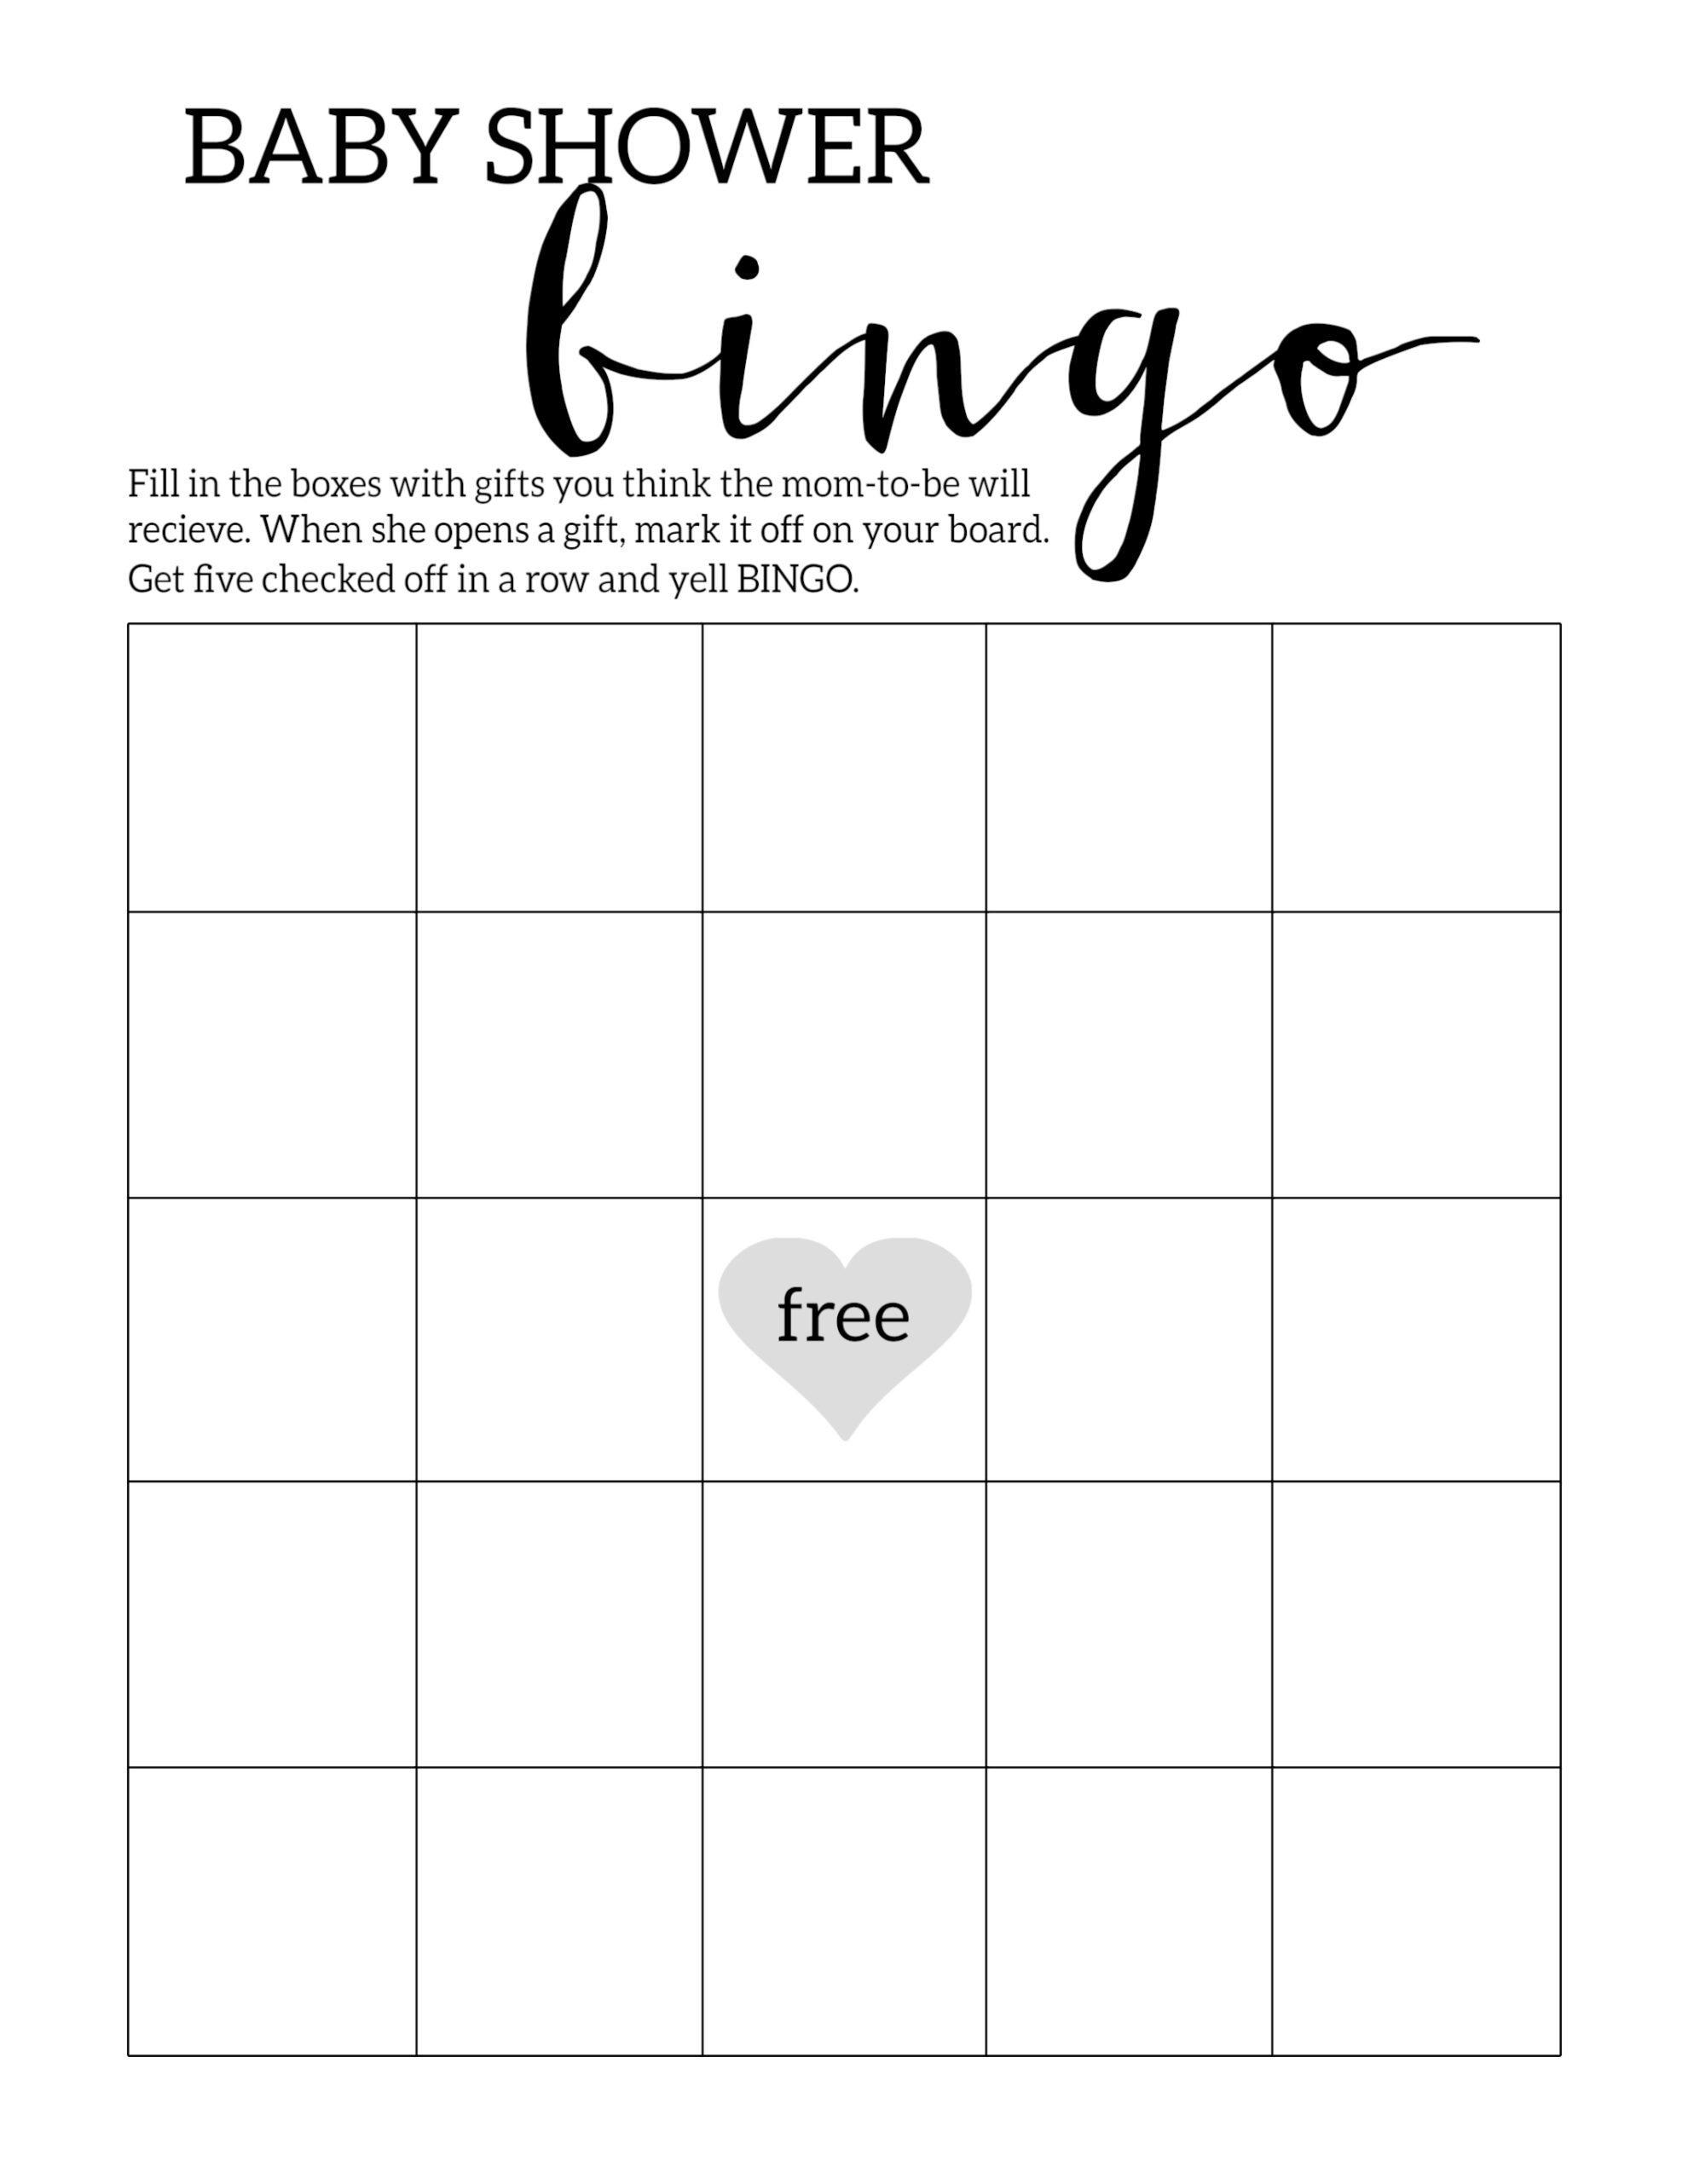 Baby Shower Bingo Printable Cards Template - Paper Trail Design - Printable Bingo Template Free